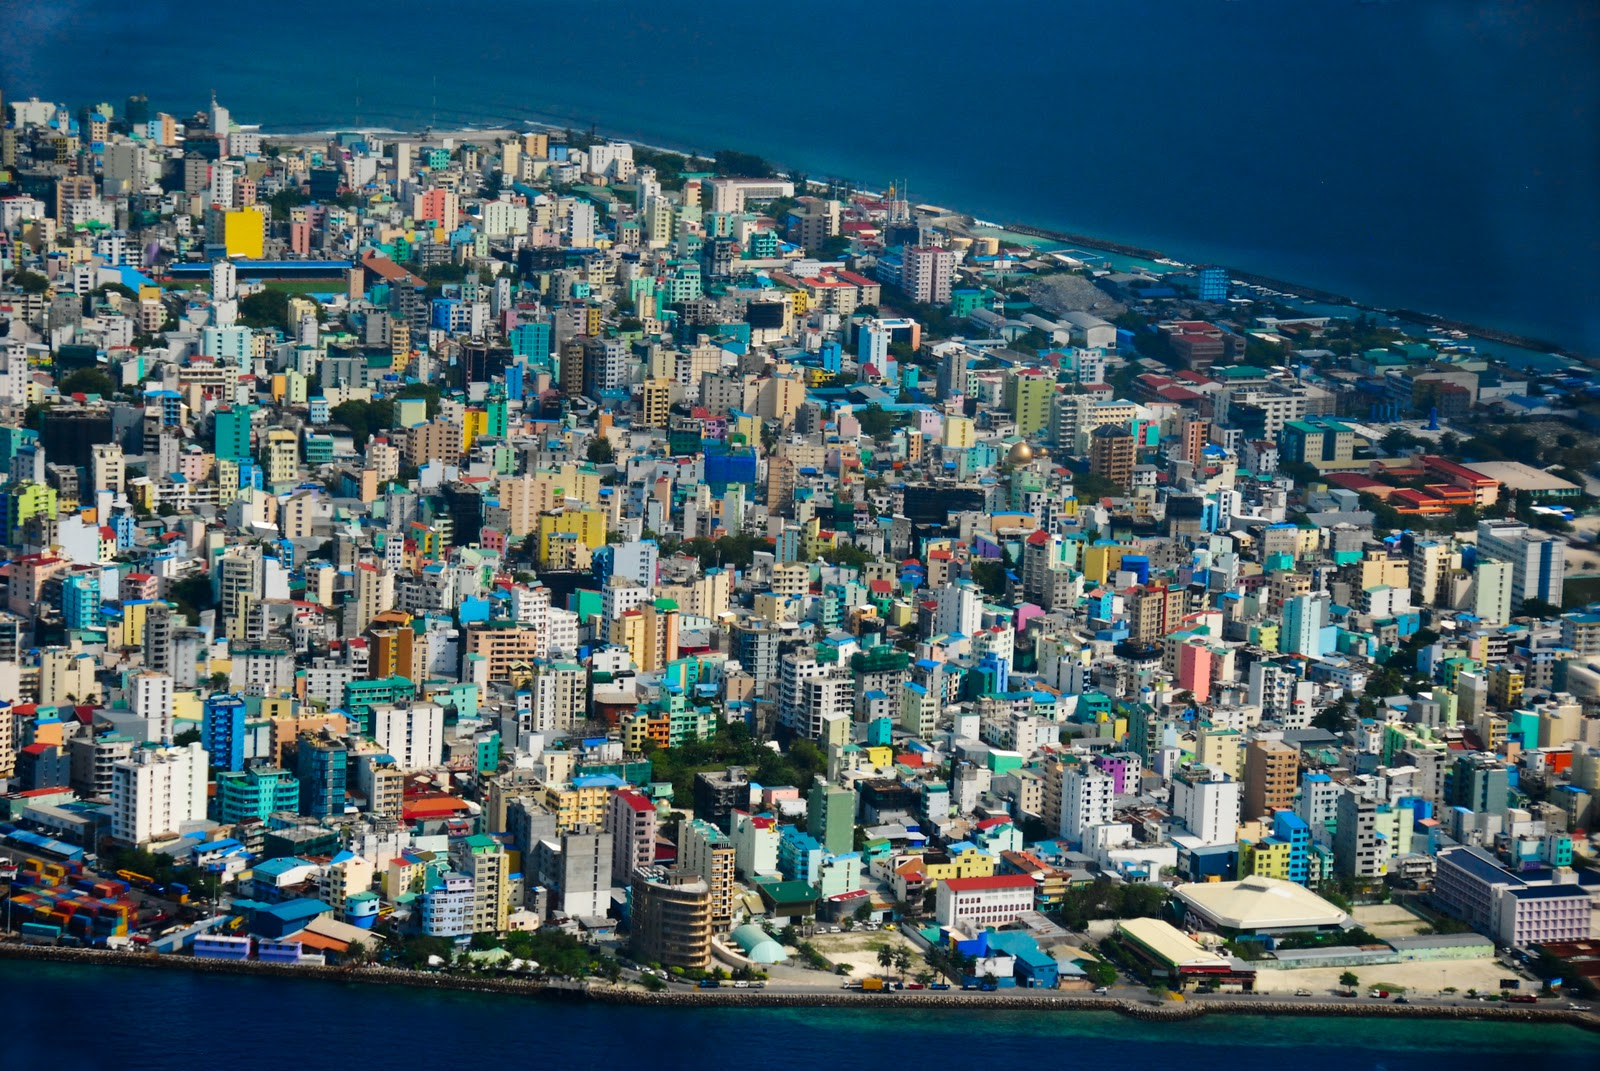 Thailand, Maldives sign trade deal